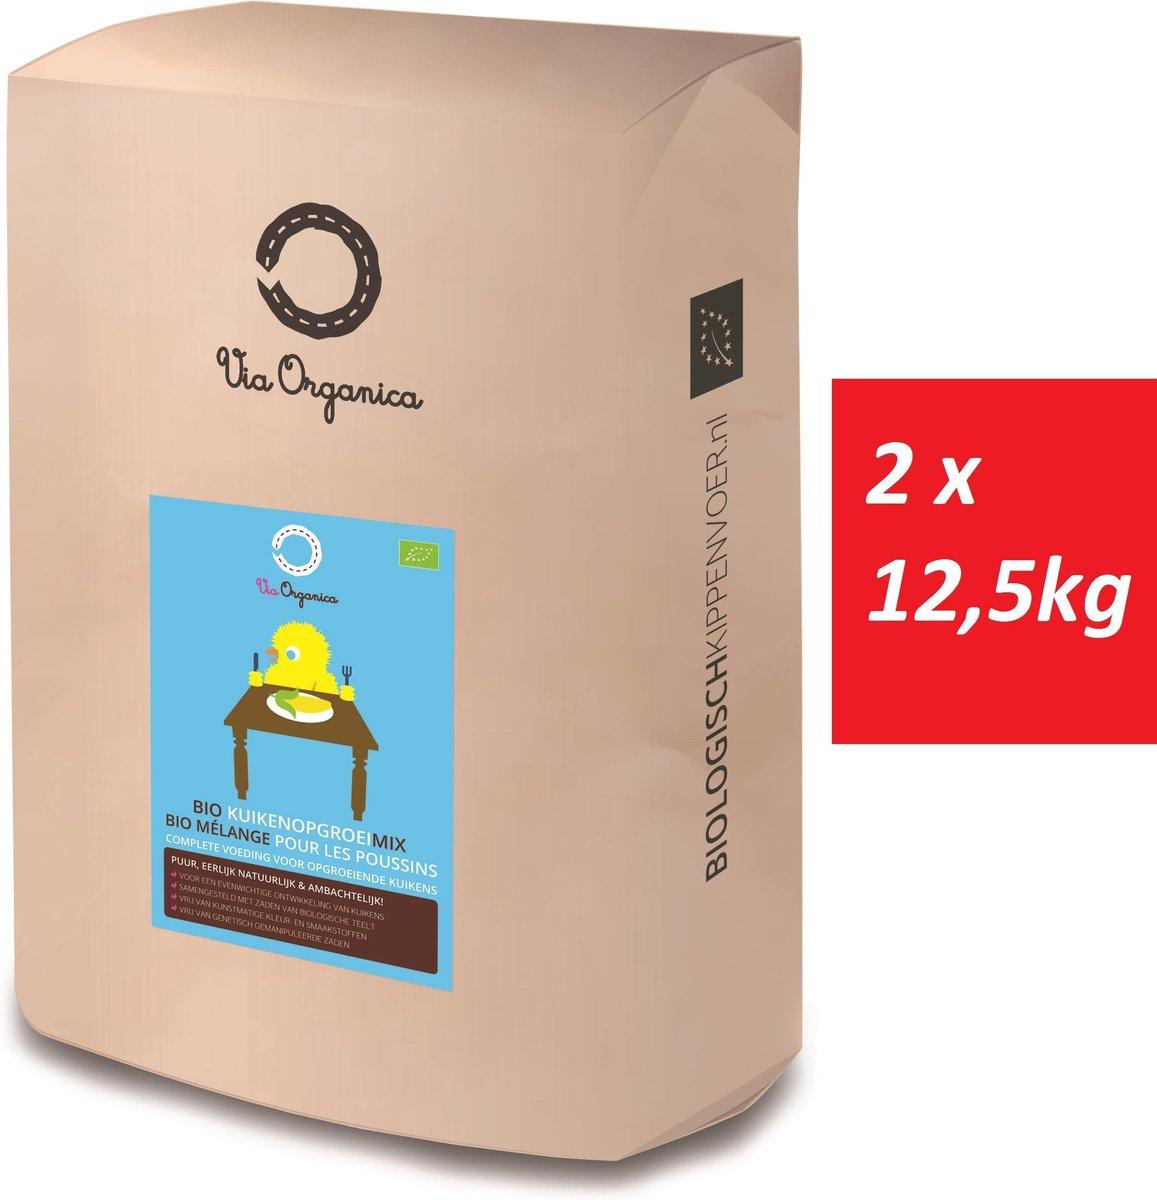 Bio Kuikenopgroeimix 2 x 12,5kg - biologisch kippenvoer - Via Organica